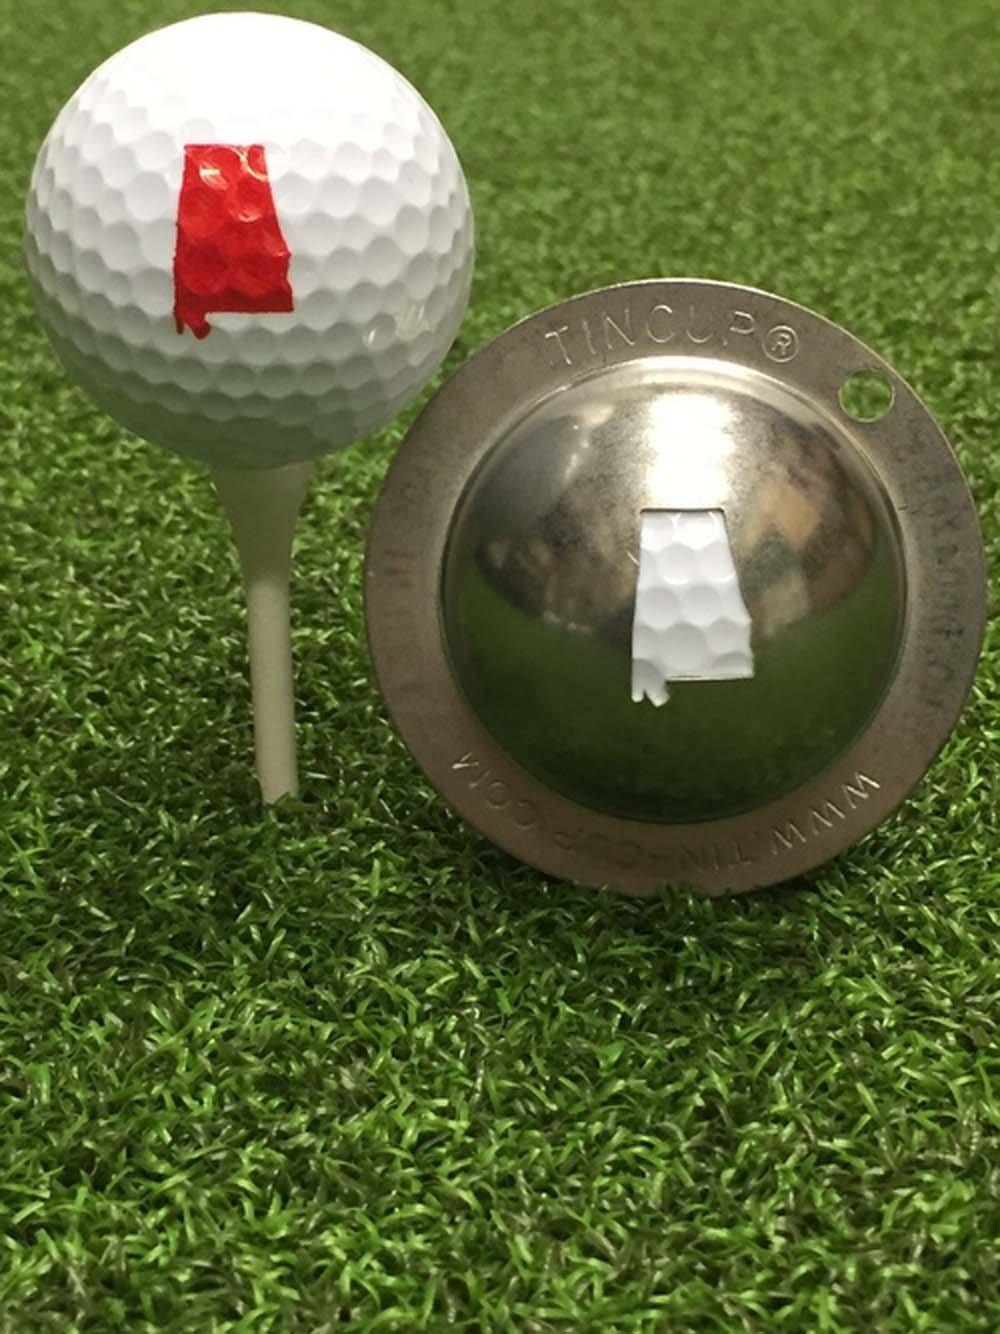 Tin Cupアラバマゴルフボールカスタムマーカー線形ツール   B0797MB7LJ